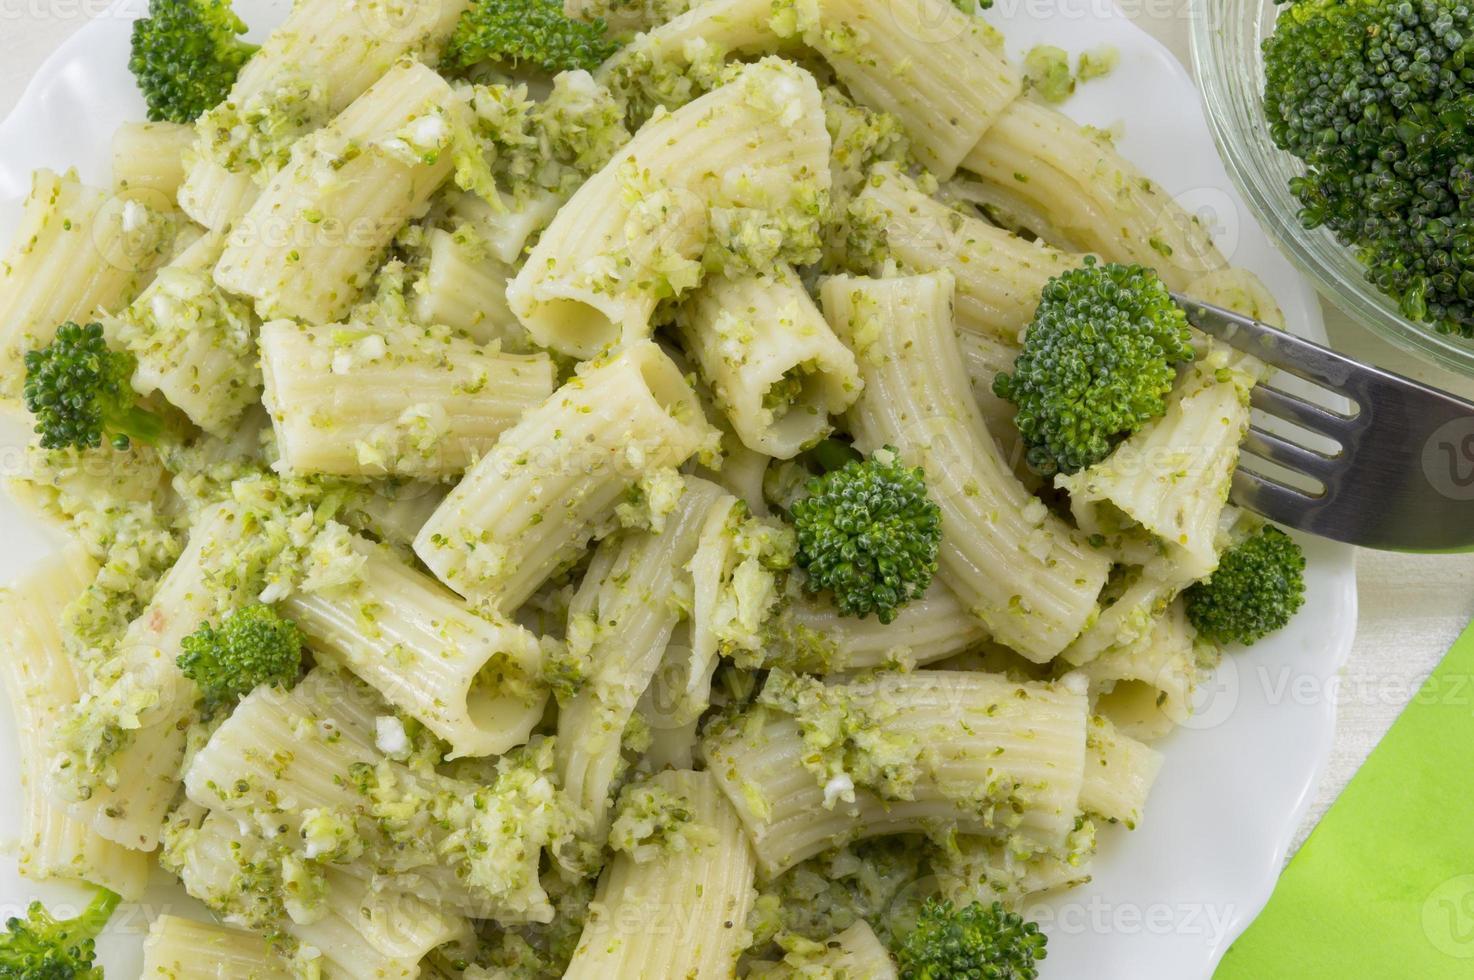 Pasta mit Brokkoli serviert mit gekochtem Brokkoli hautnah foto